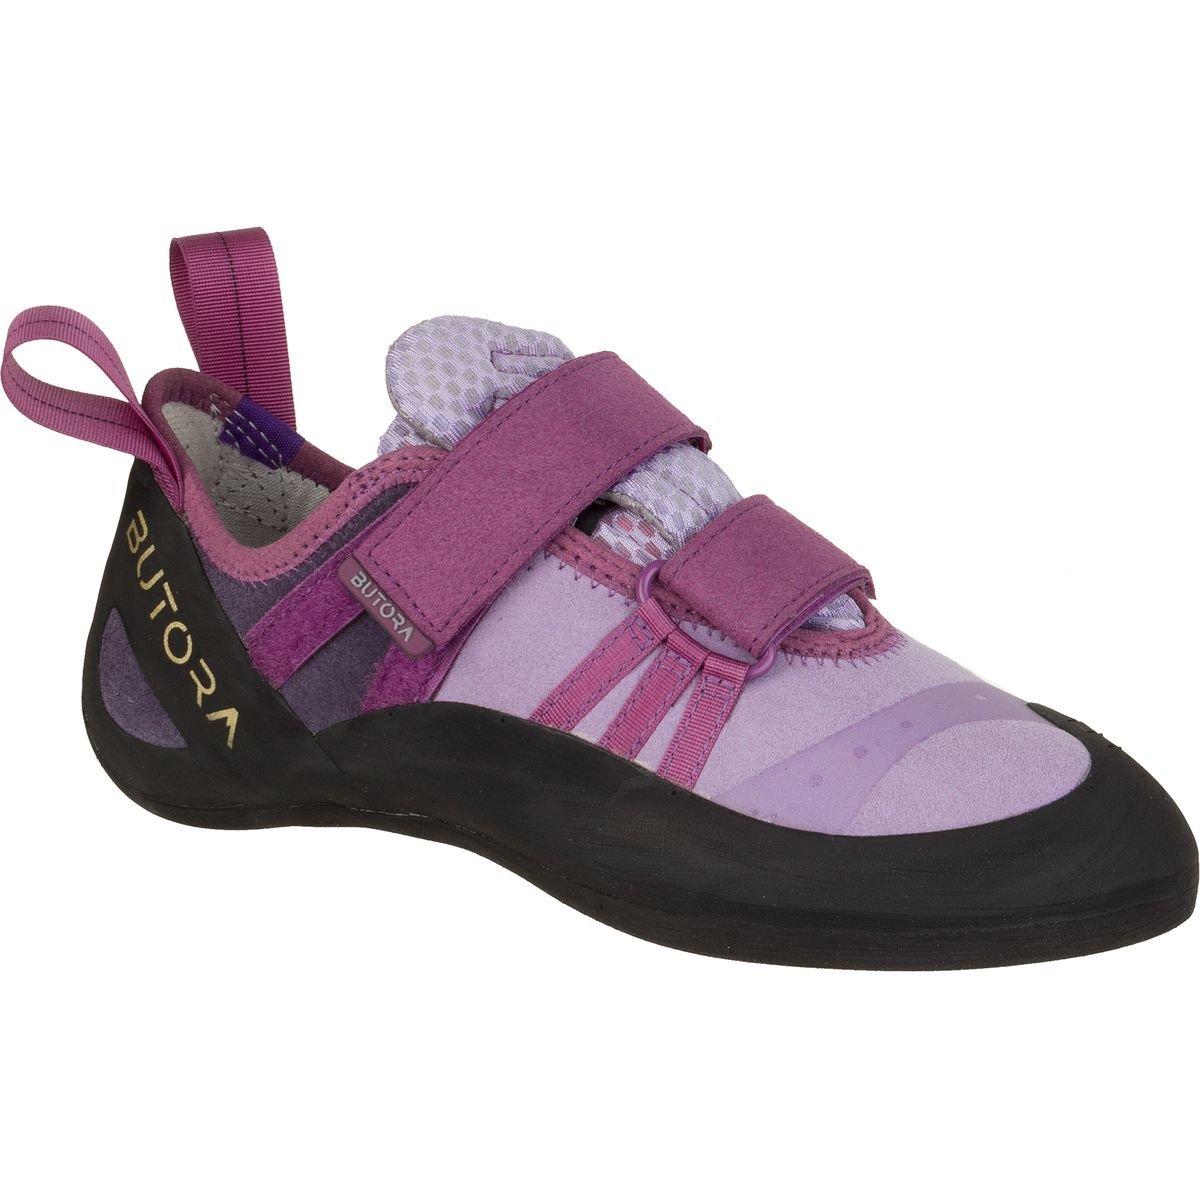 Butora Endeavor Tight Fit Climbing Shoe - Women's Lavender 5.5